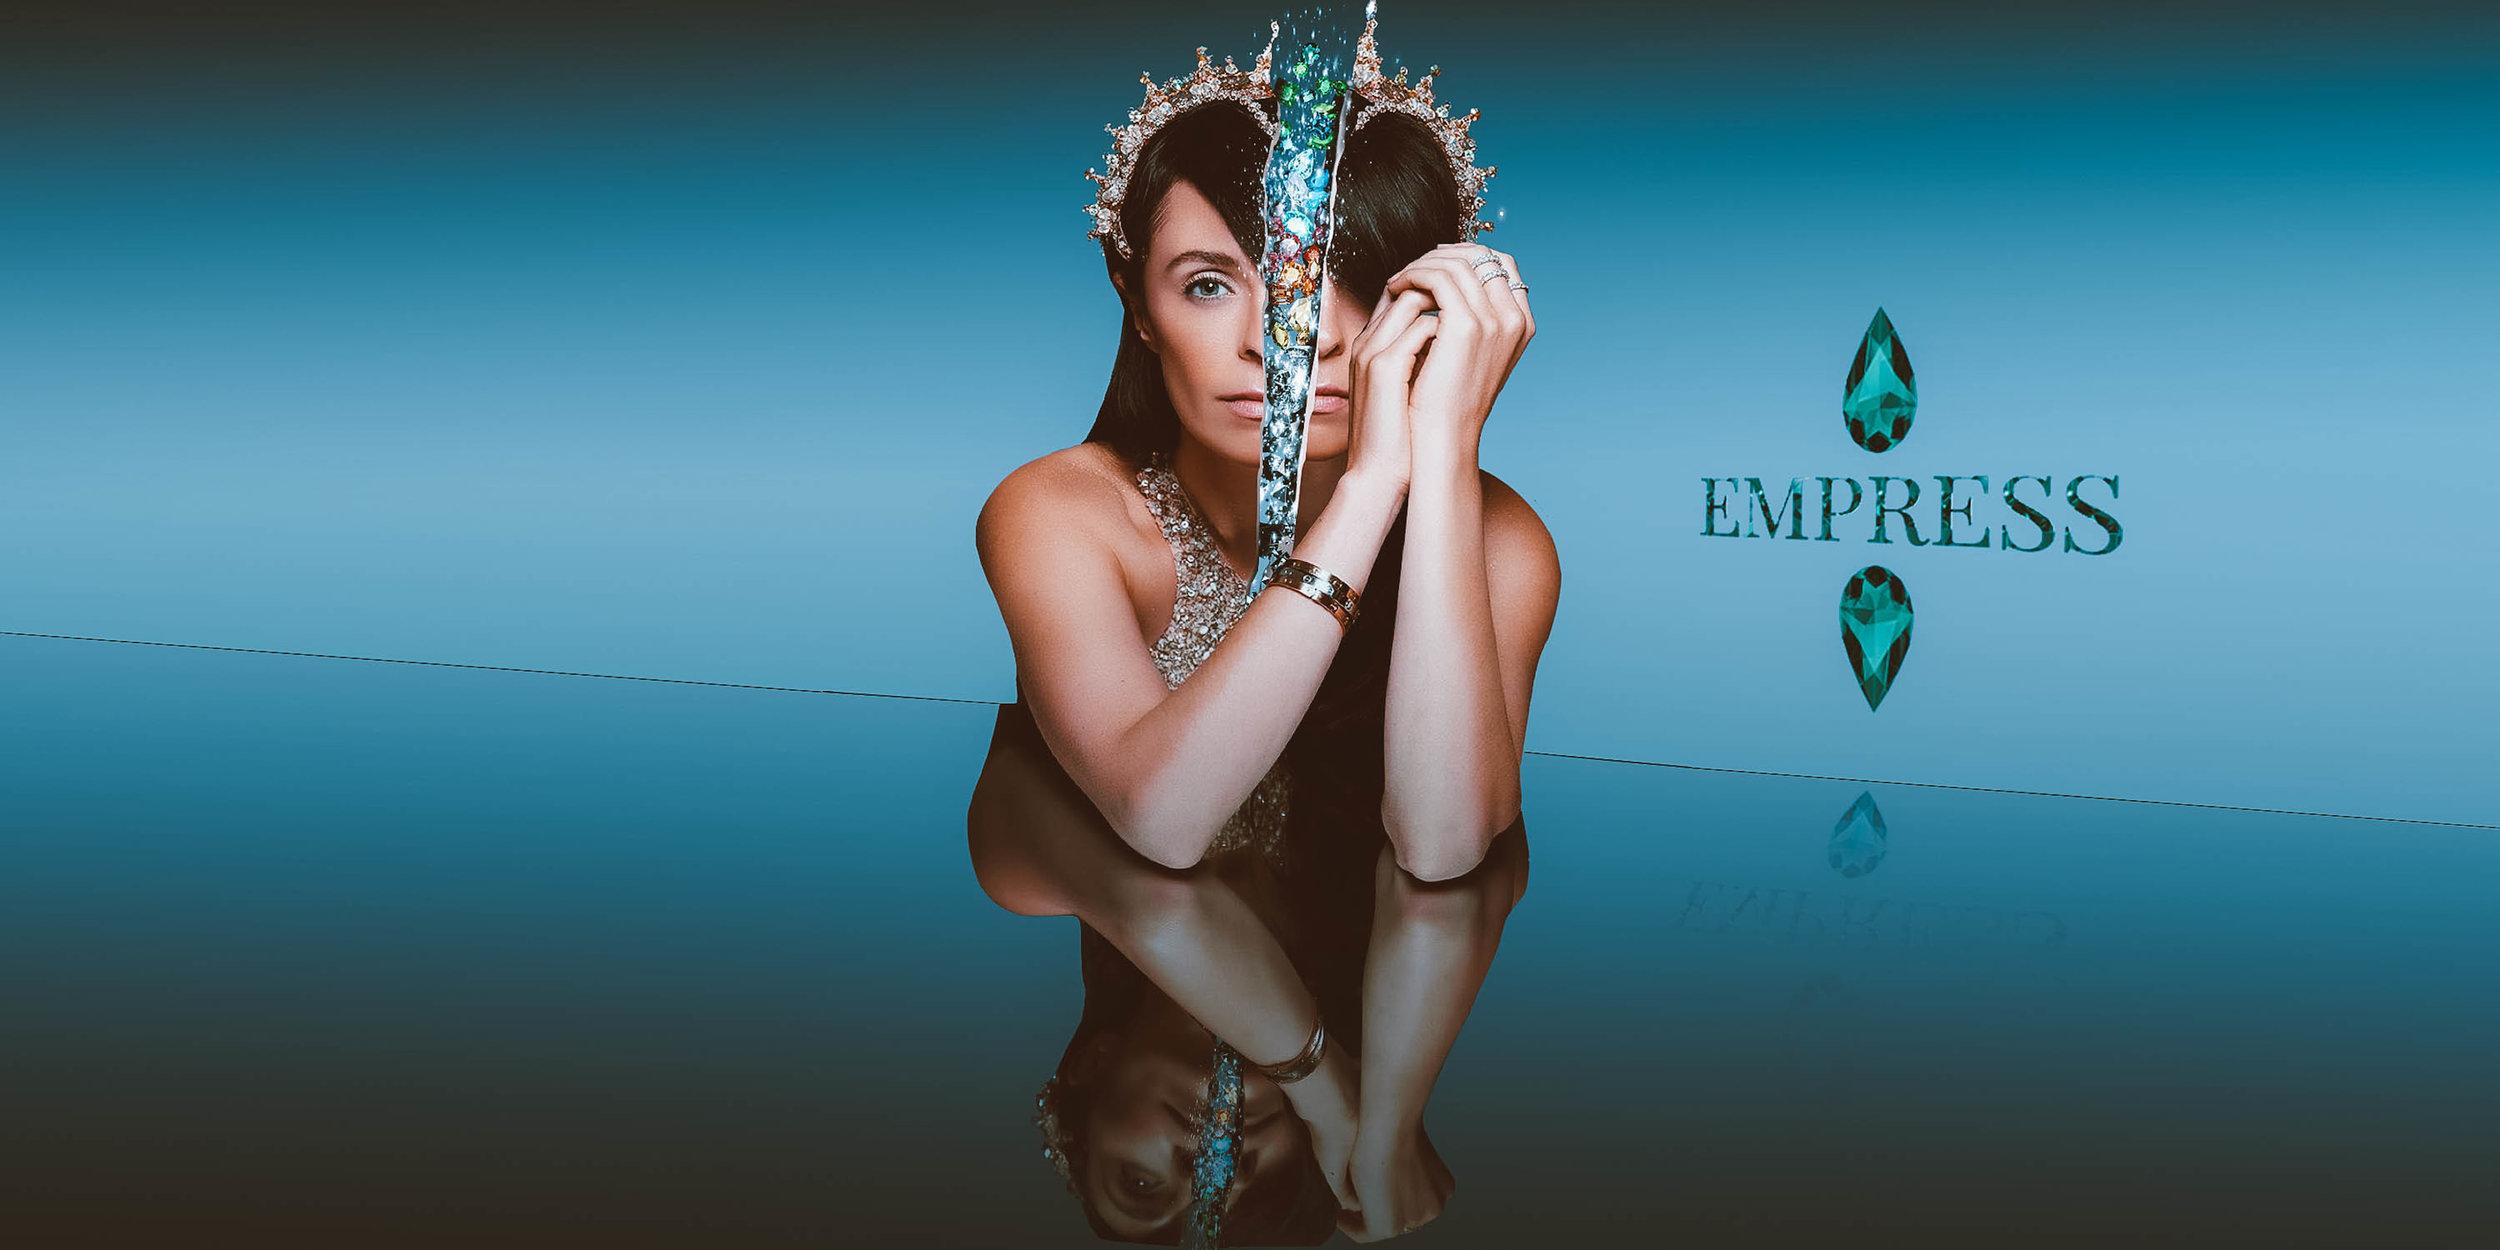 EmpressPoster.jpg